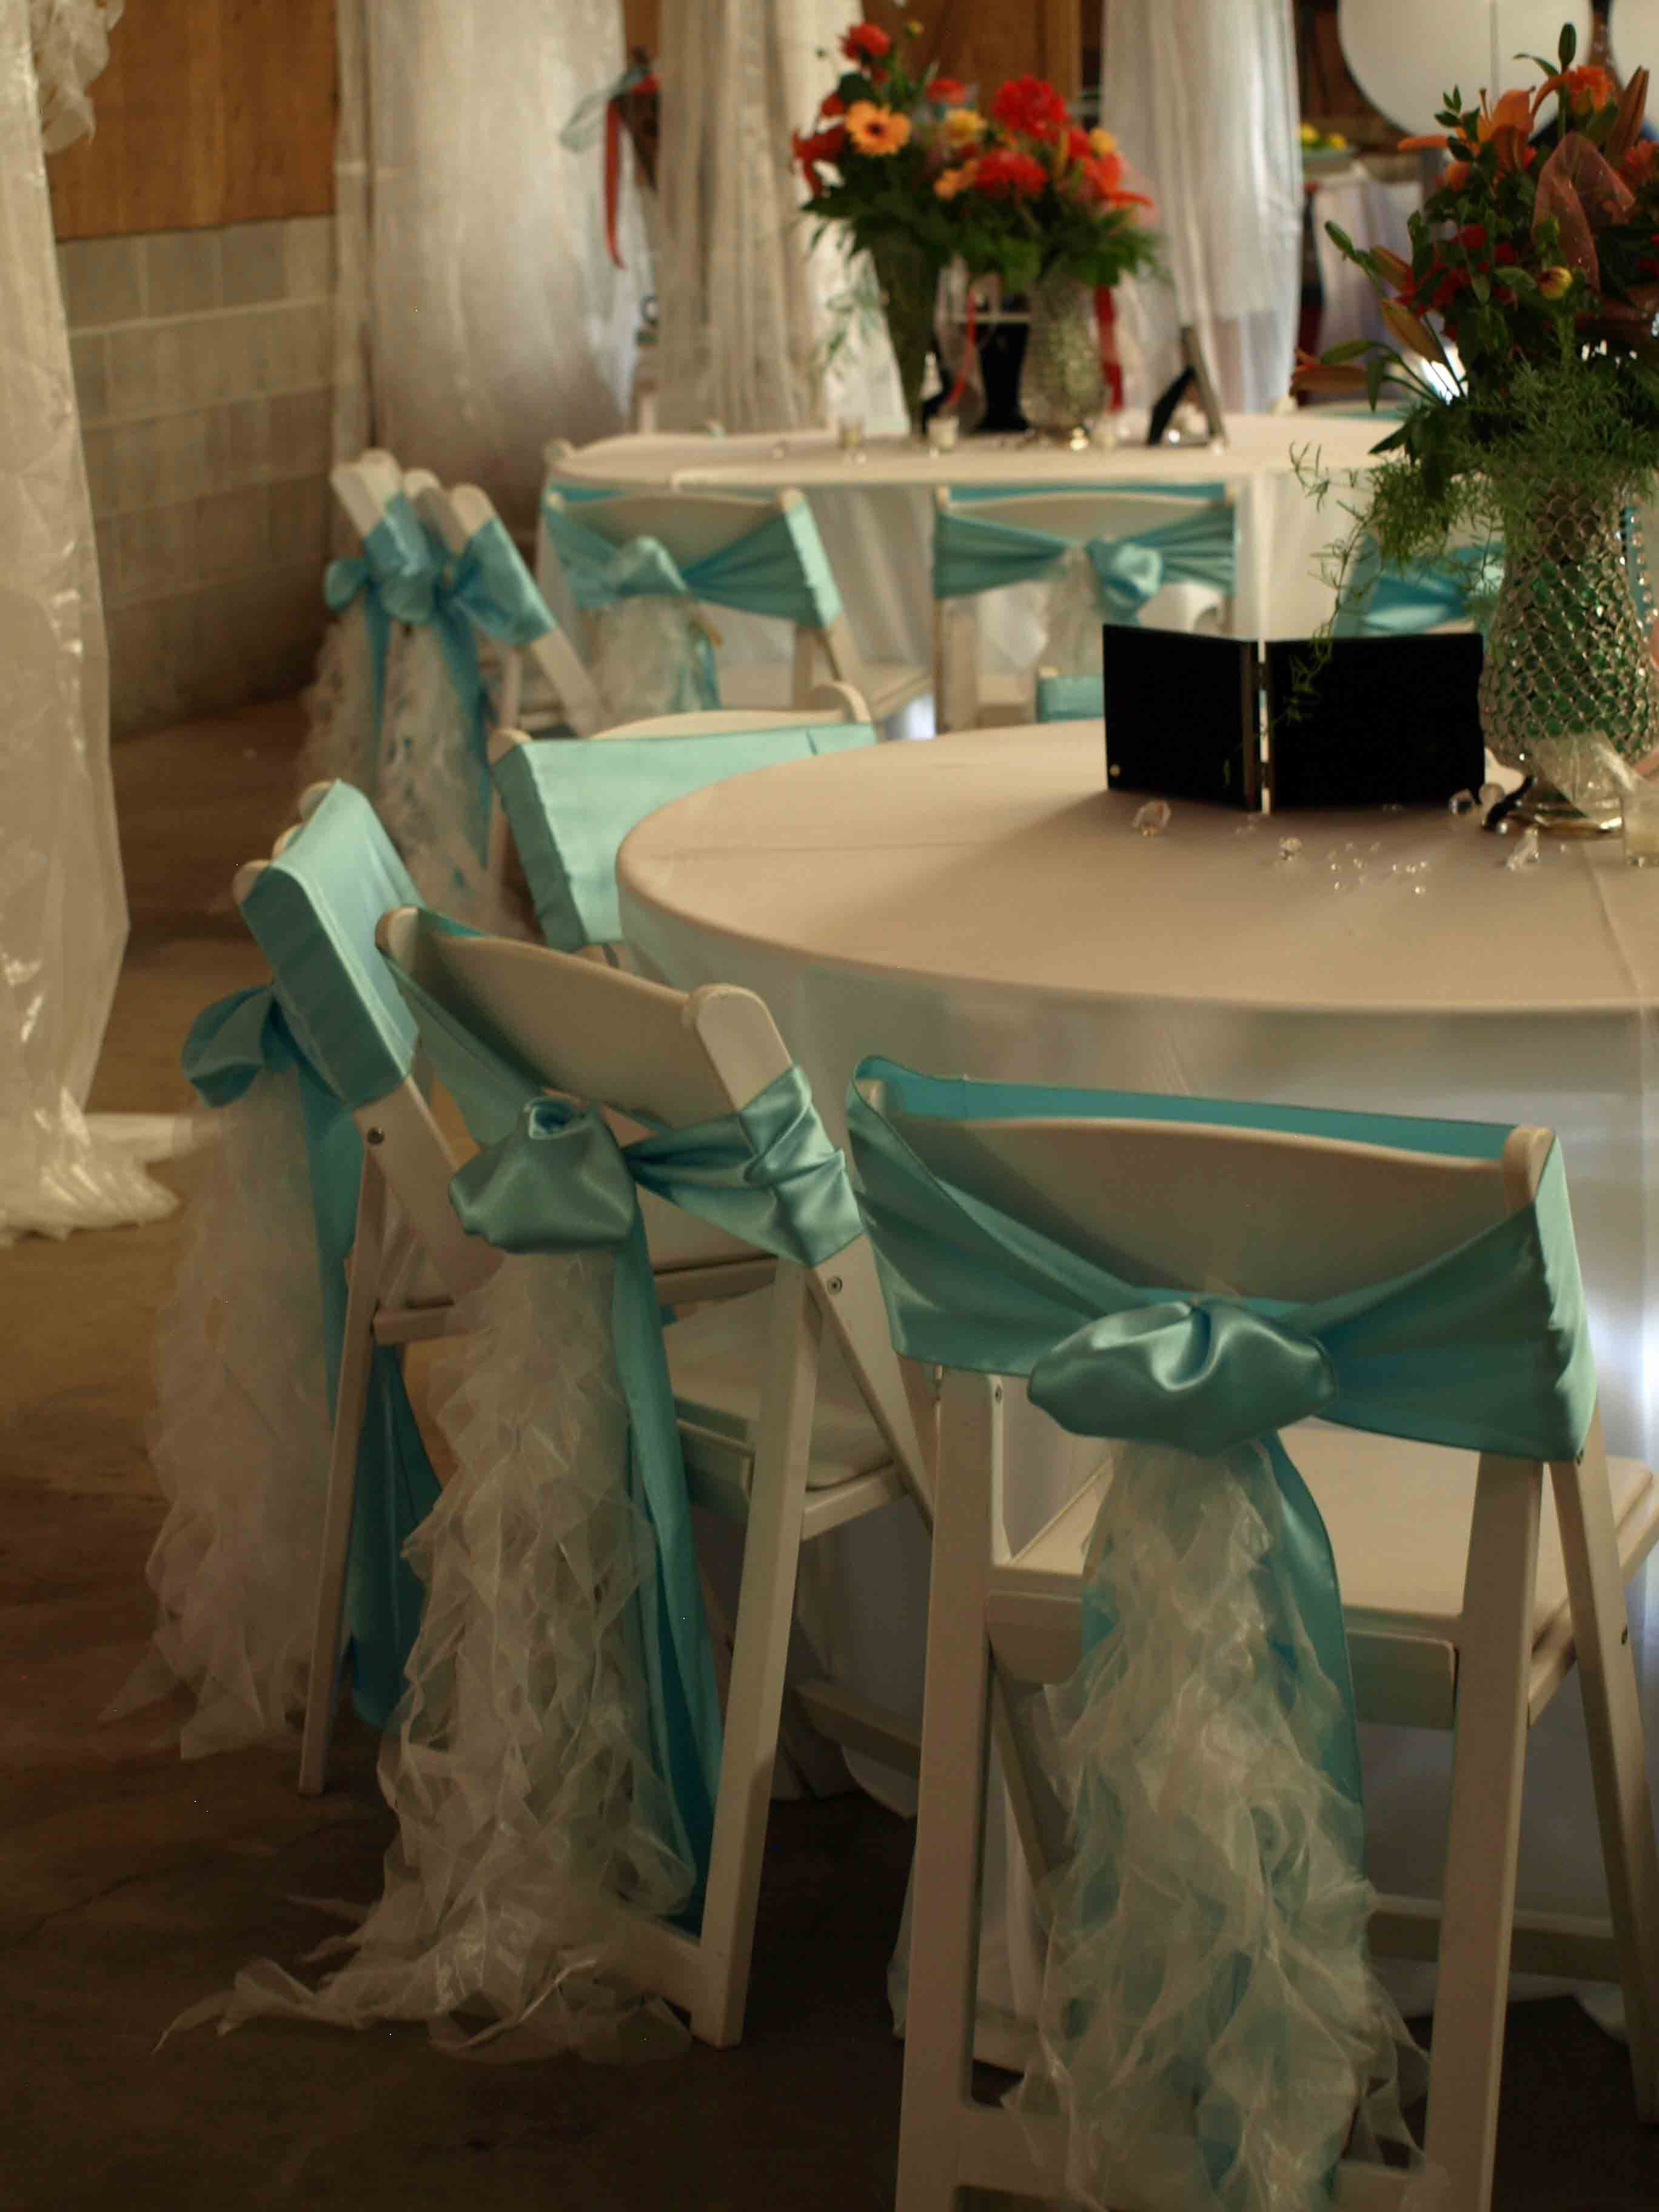 mantel blanco y pa±oleta de las sillas turquesa